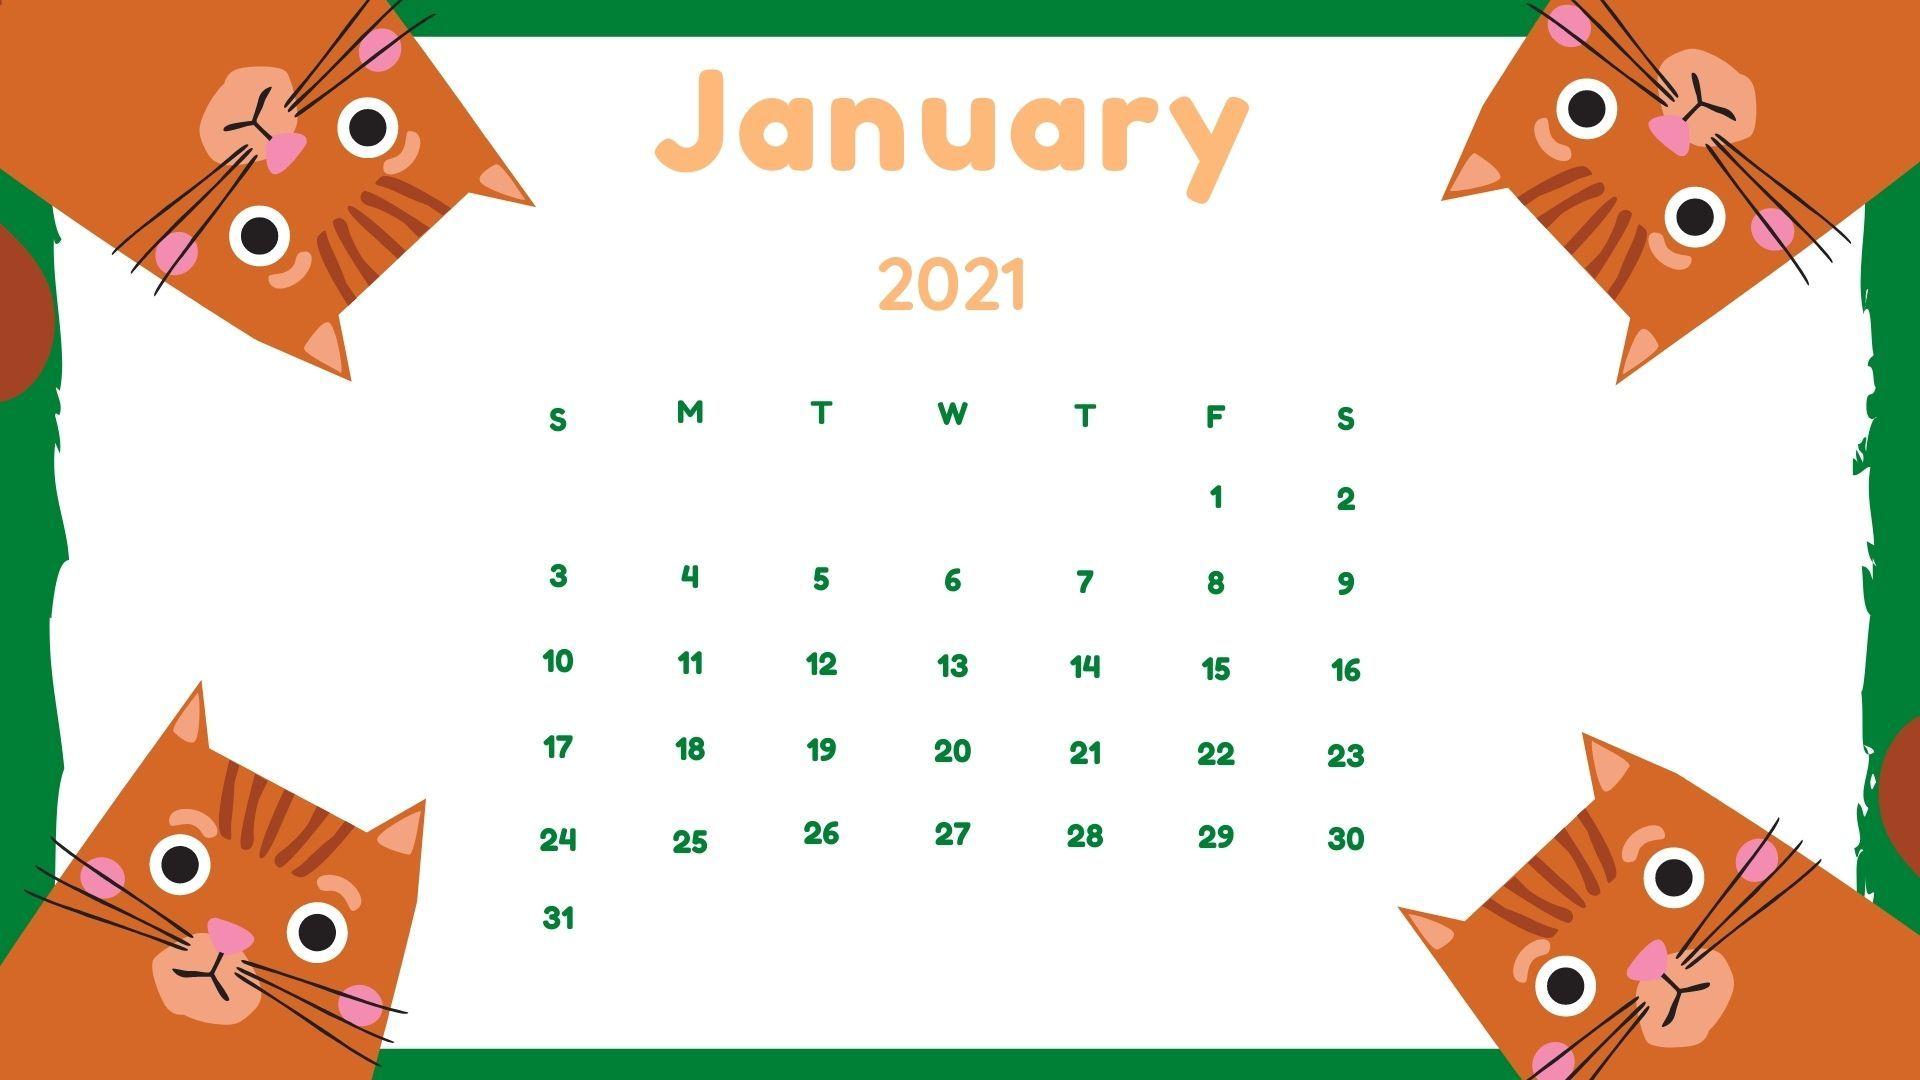 Free Download January 2021 Hd Calendar Wallpaper In 2021 Free Printable Calendar Templates Calendar Wallpaper Cute Calendar